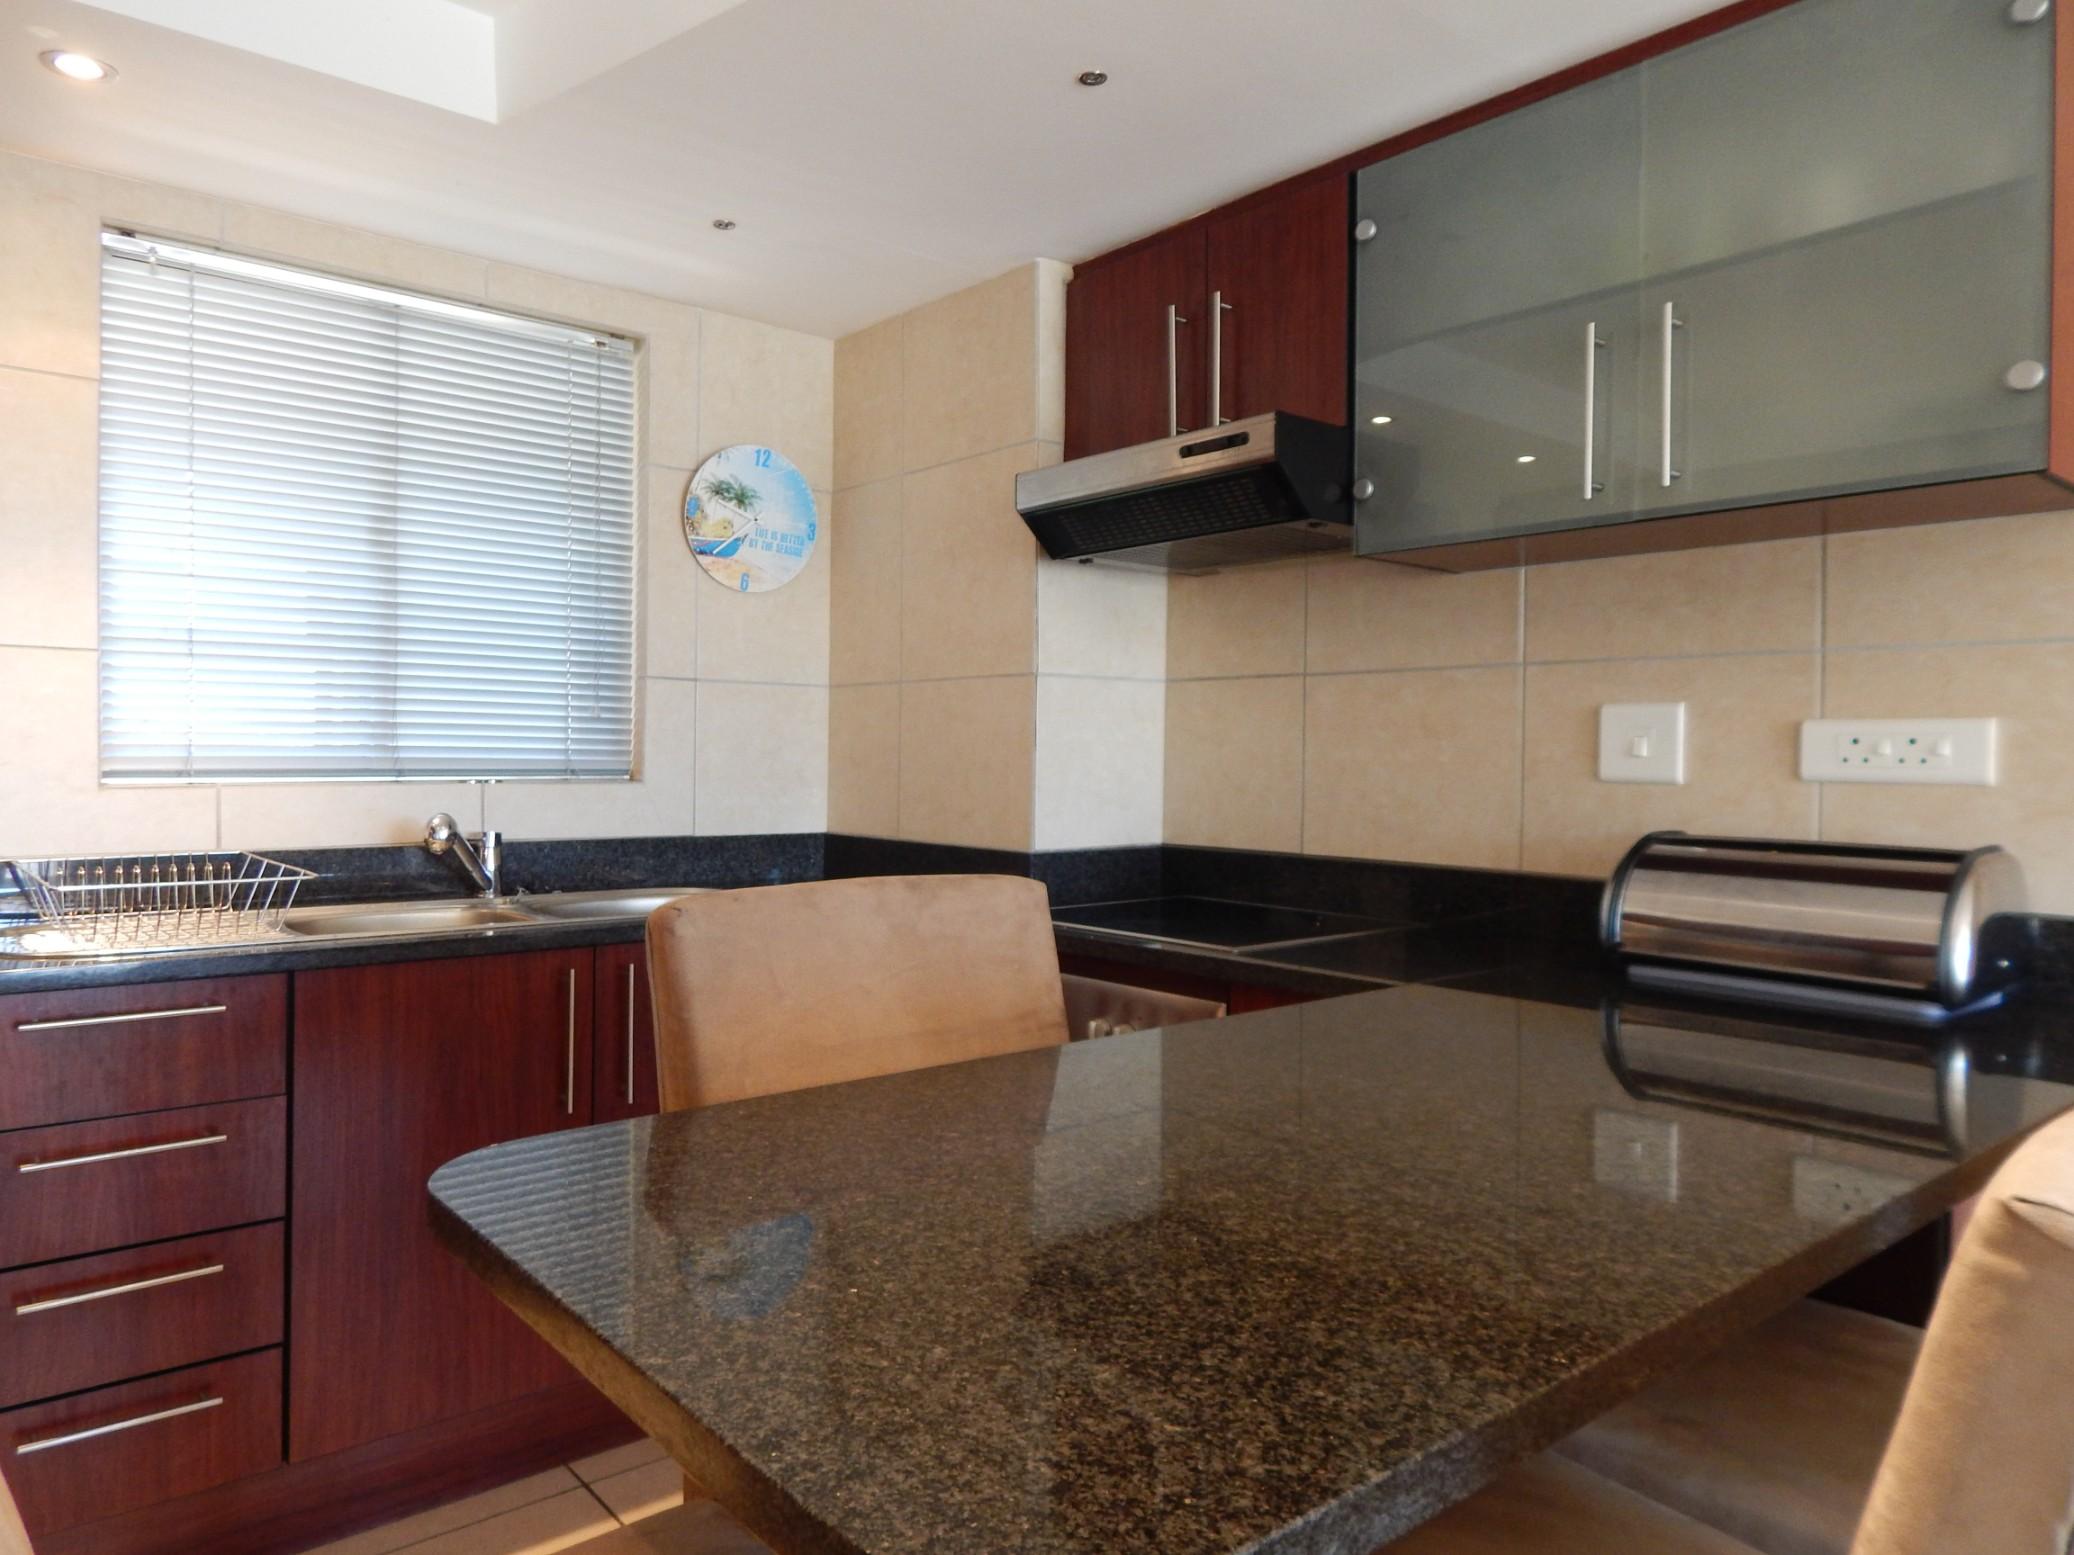 2 Bedroom Apartment for sale in De Bakke ENT0067862 : photo#17